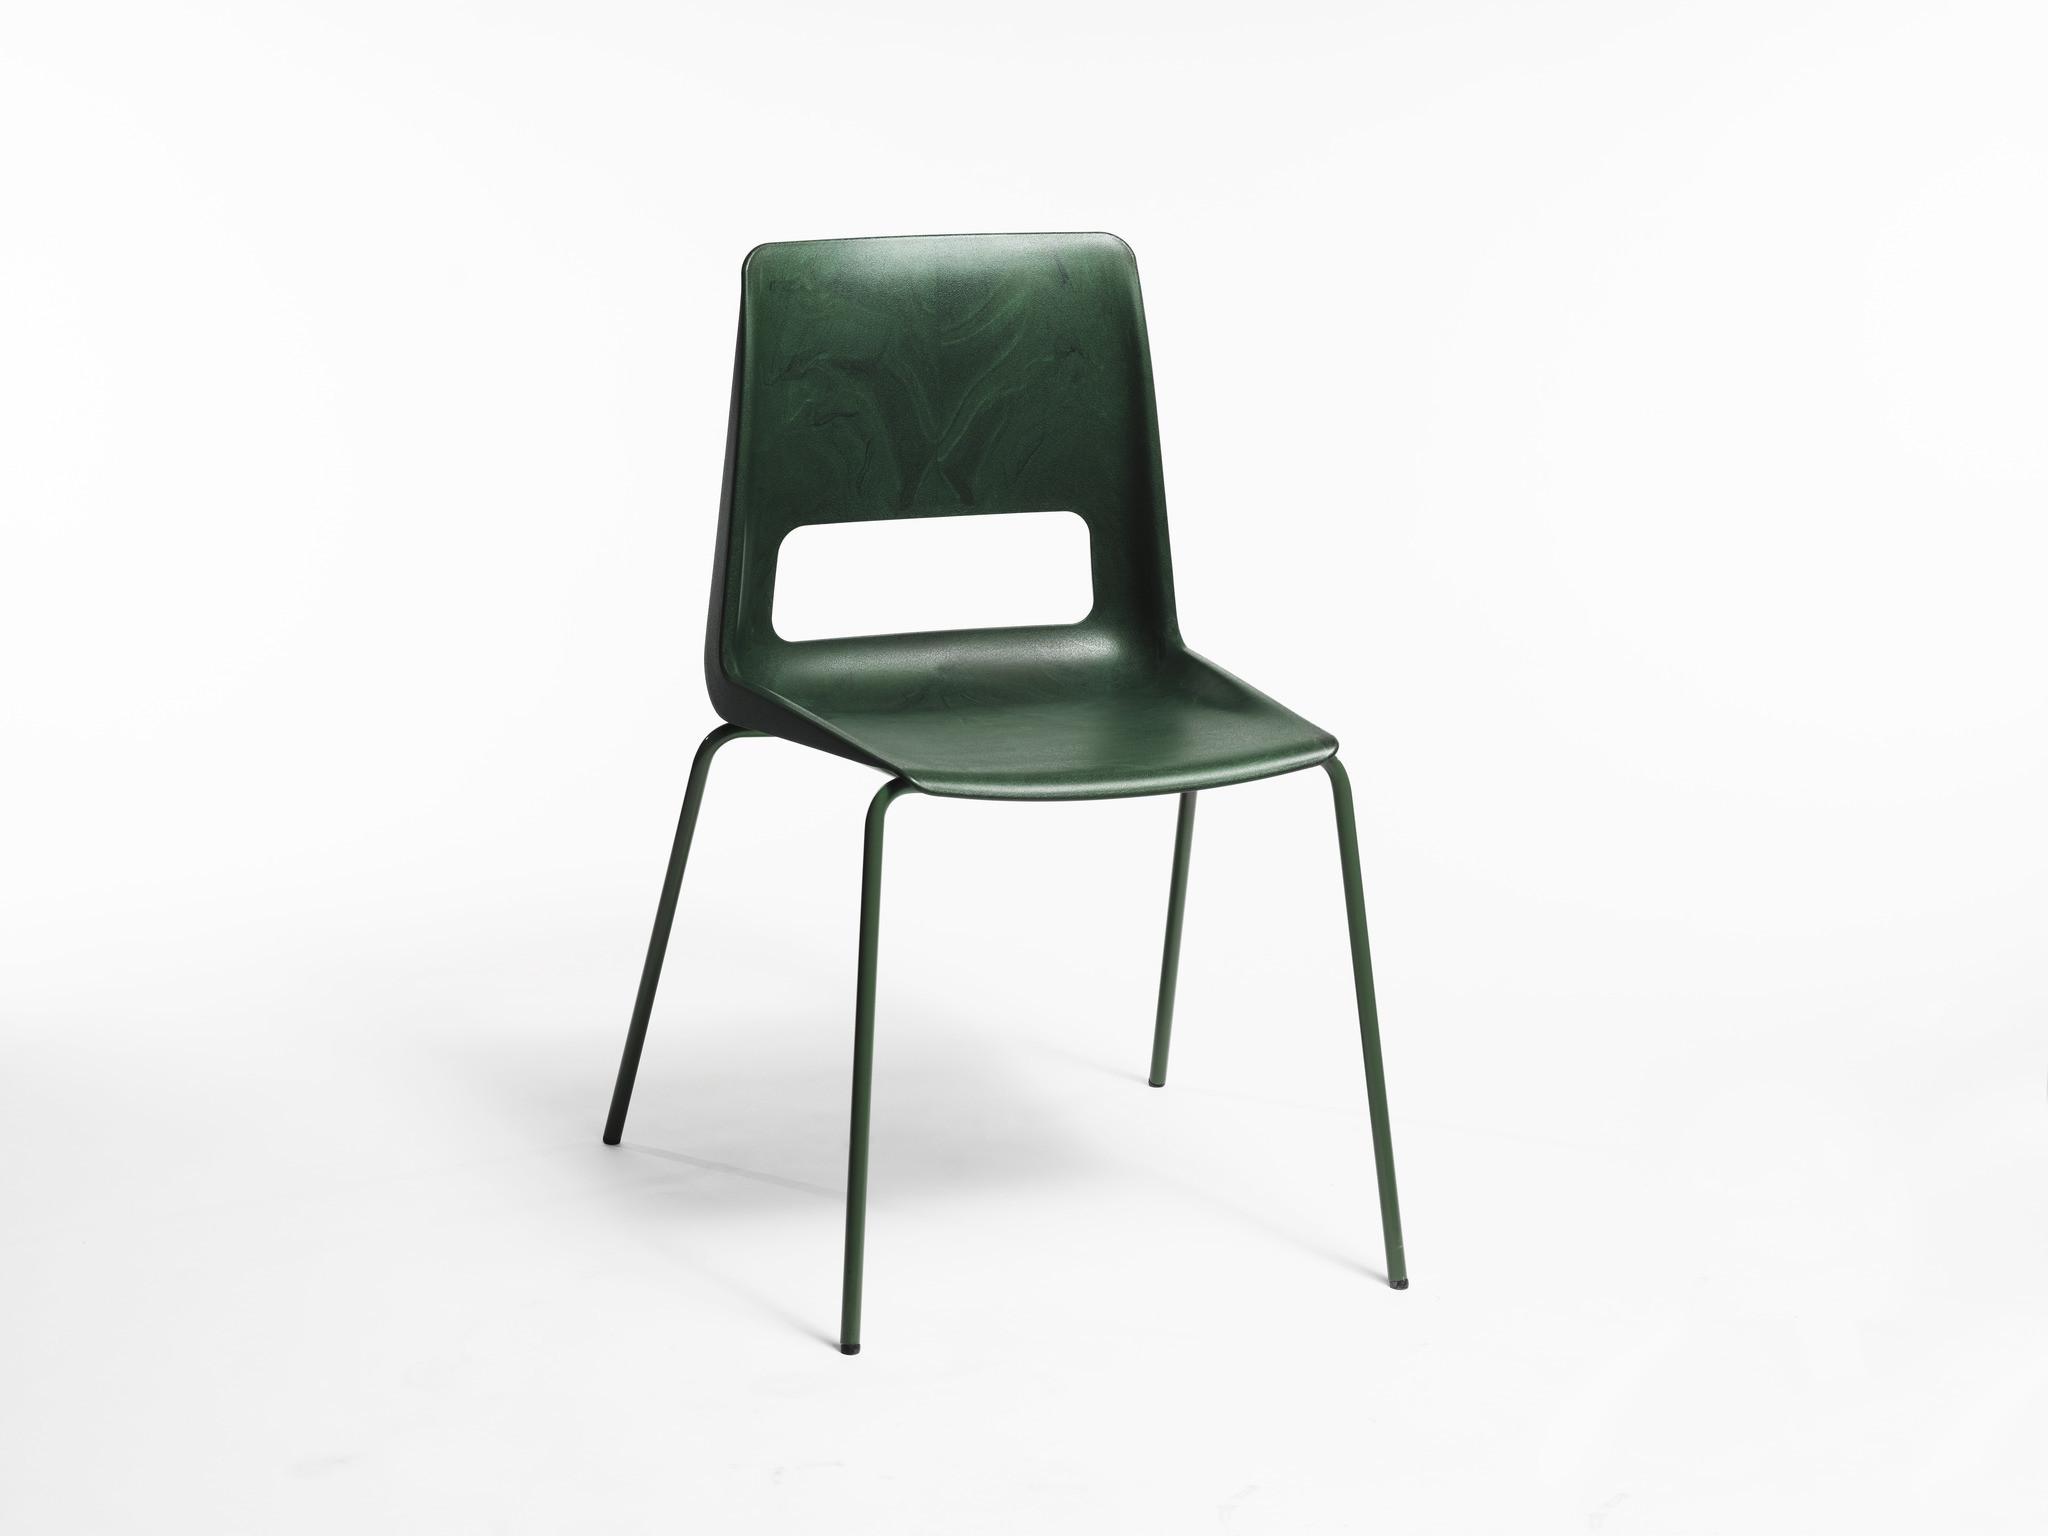 Minimalist Chair Created by Stockholm-Based Designers Snøhetta